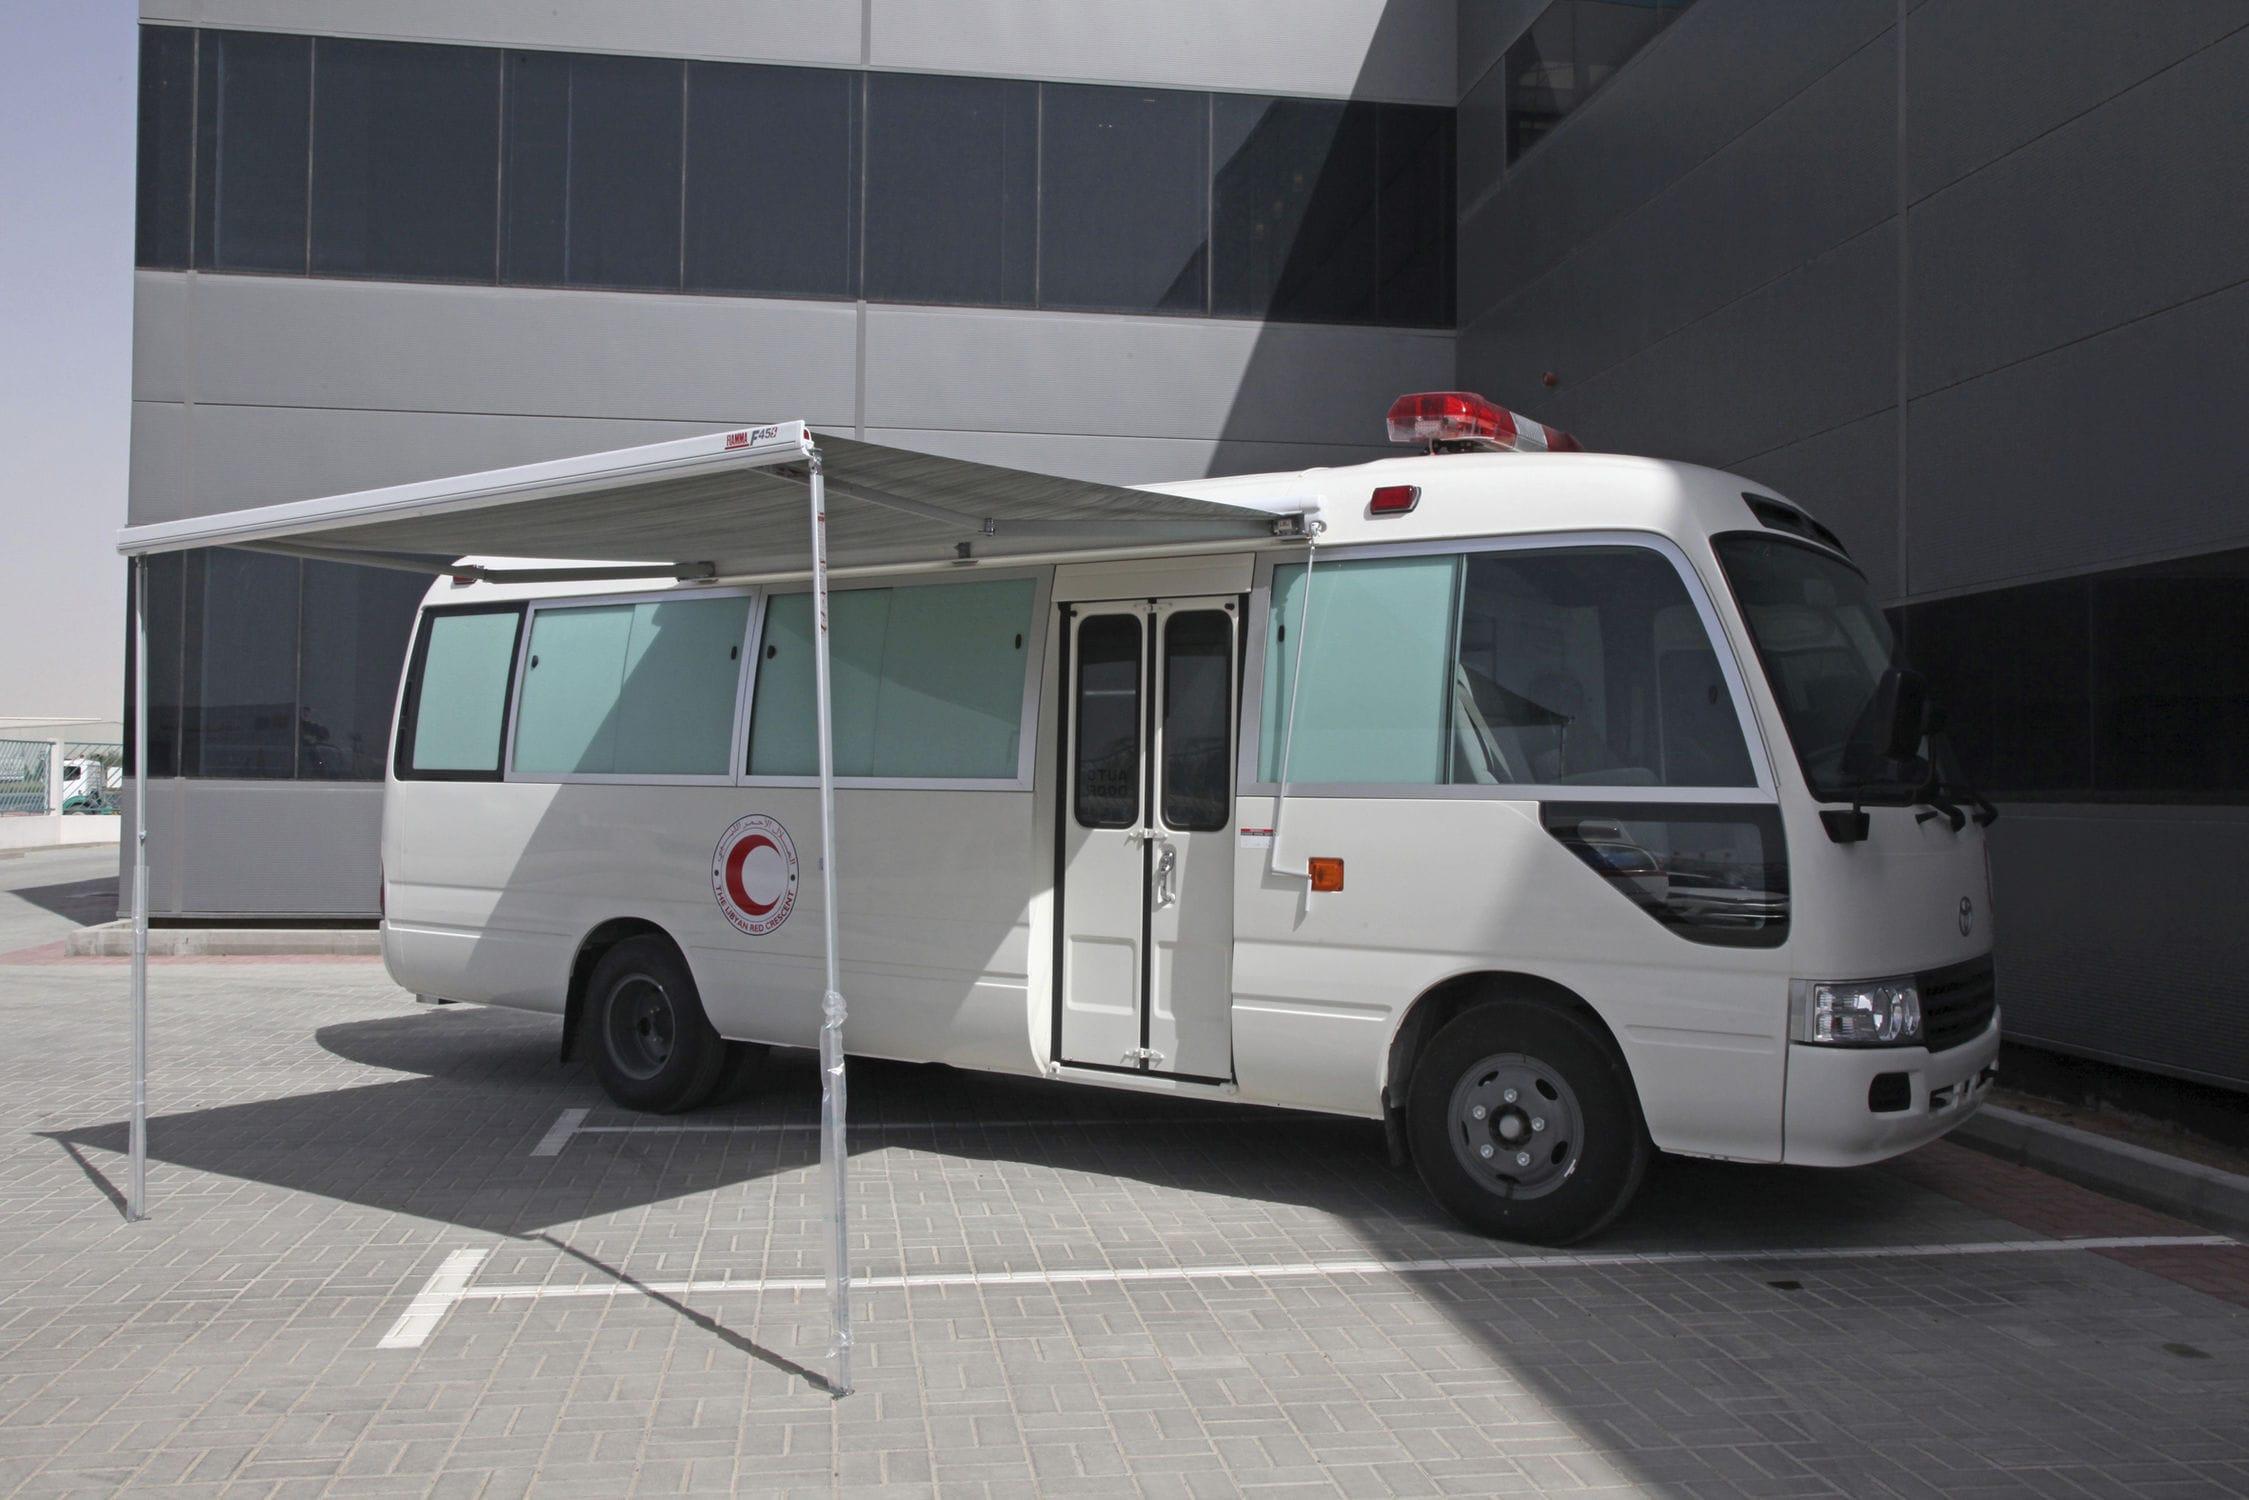 Laboratory mobile health vehicle / bus - TOYOTA COASTER